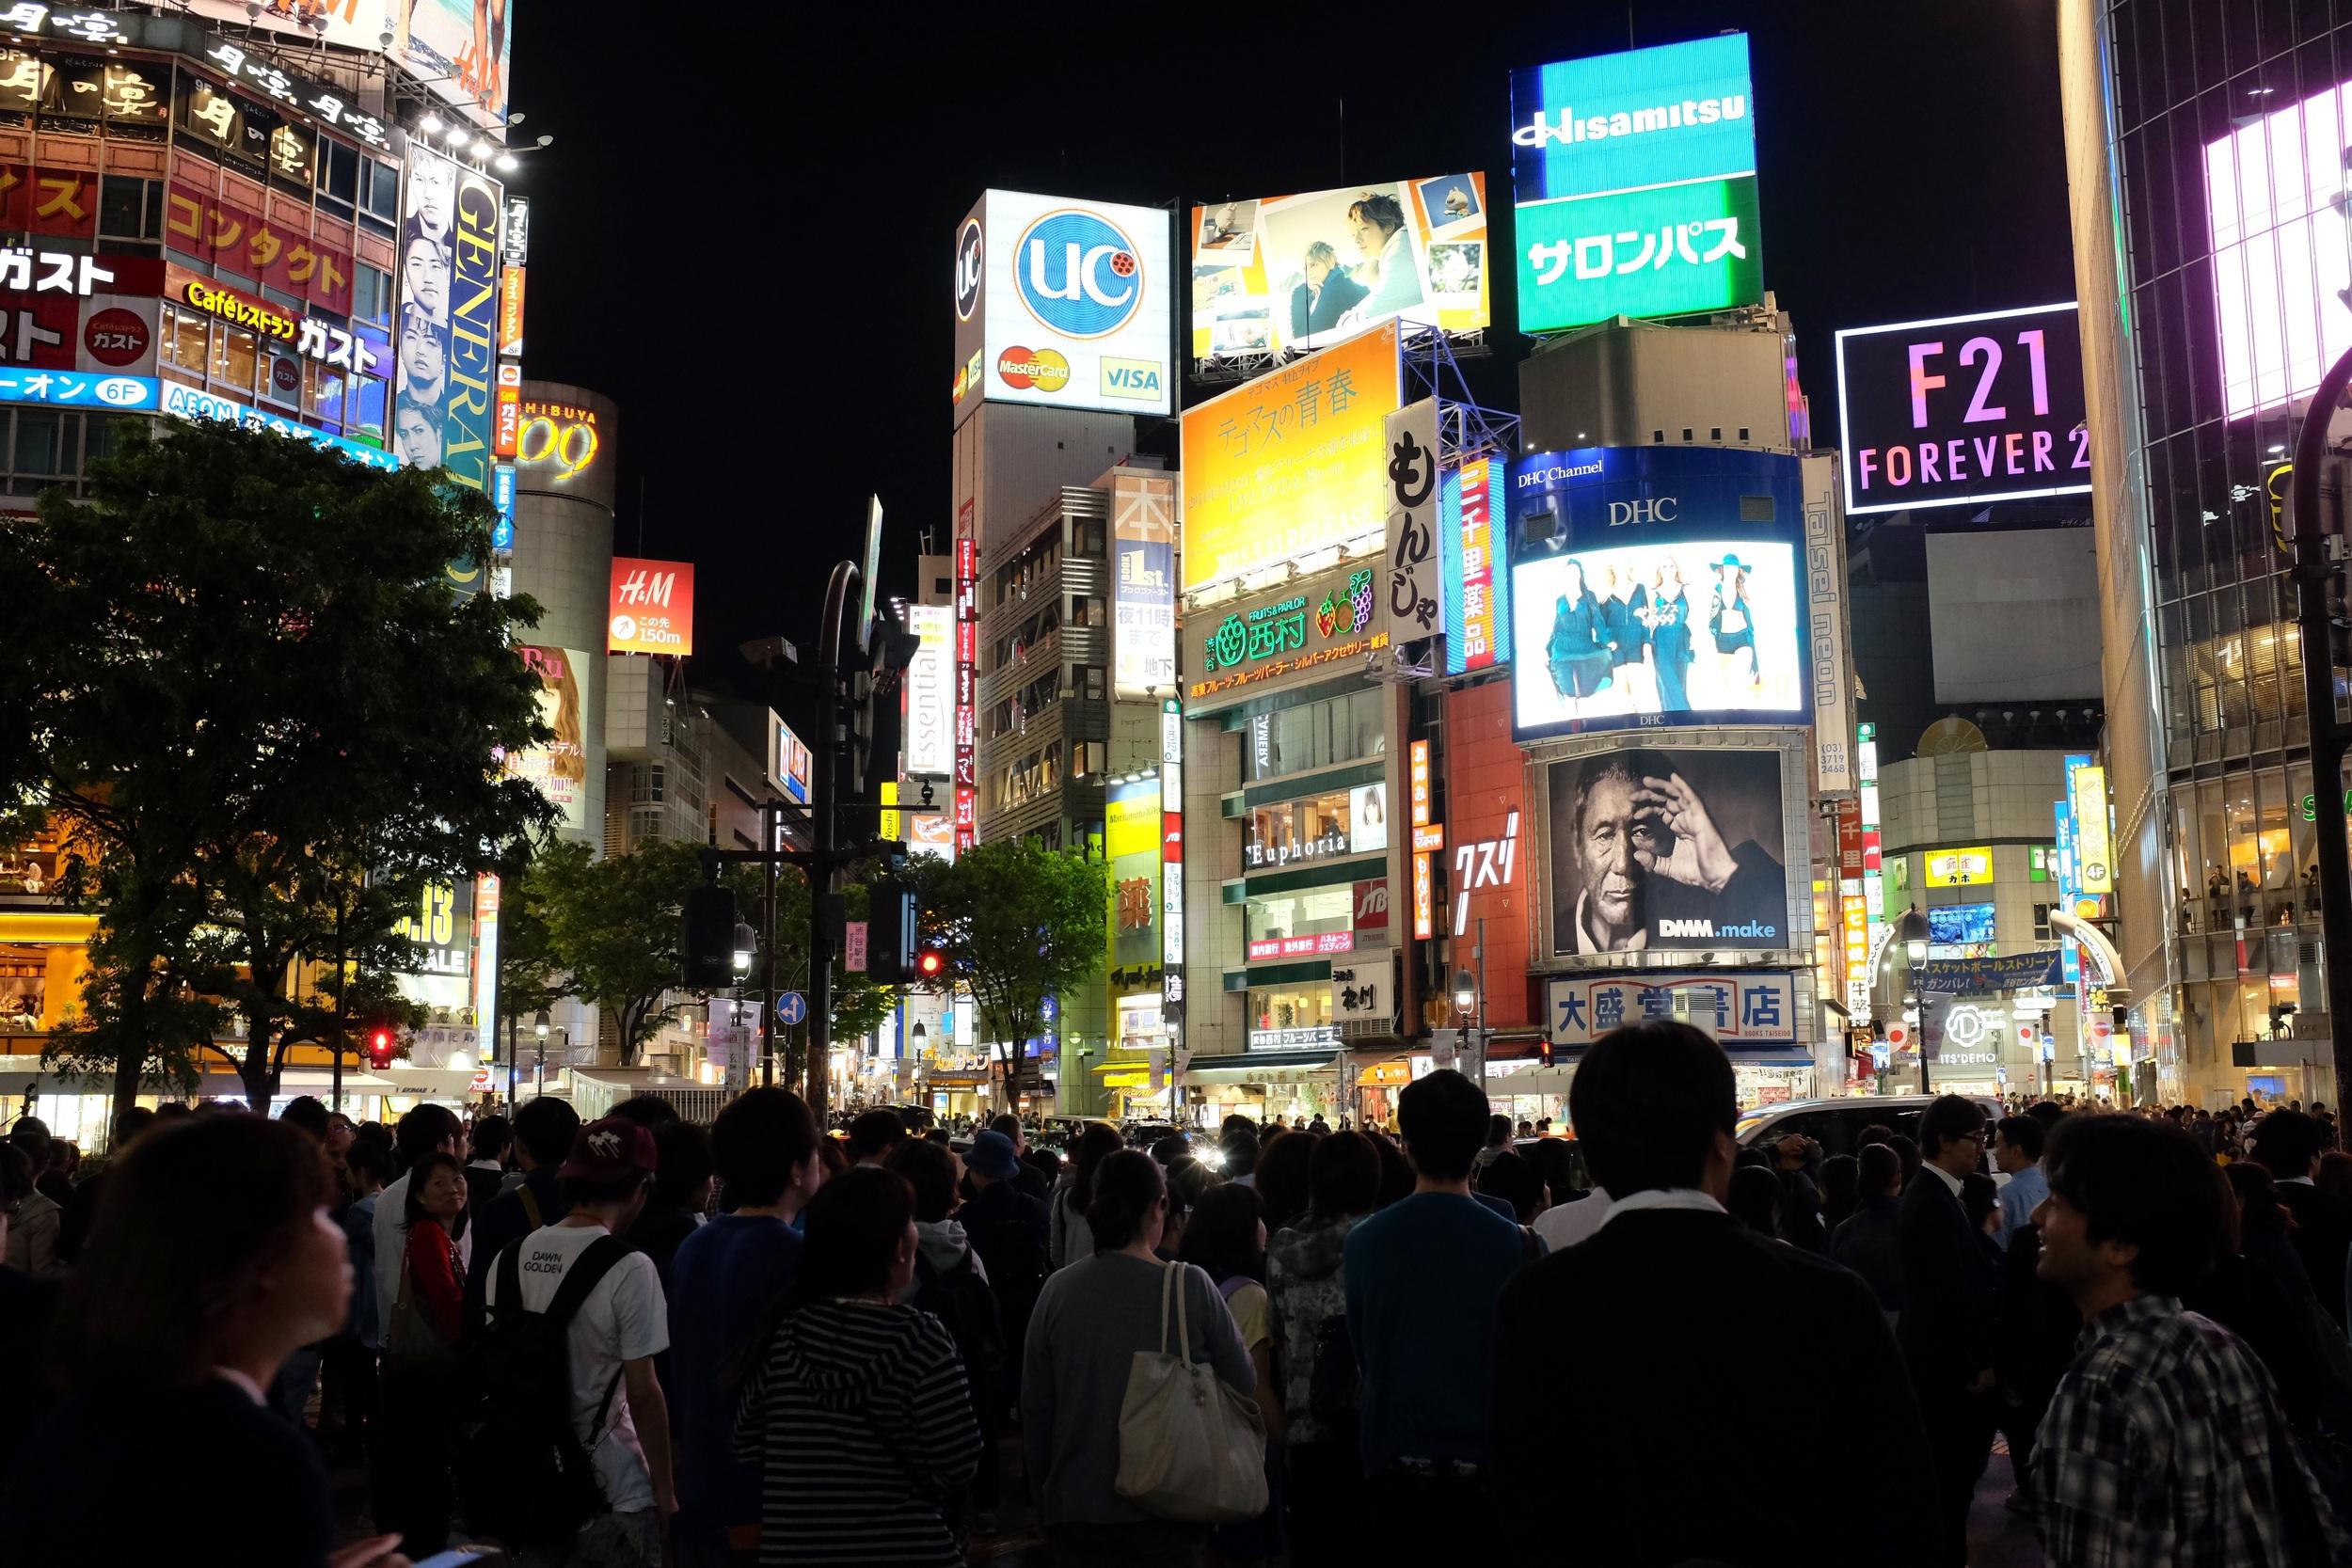 Shibuya, Tokyo. Fujifilm x100t, ISO 2000, f/4, 1/60 sec. No edit. Straight out of camera.